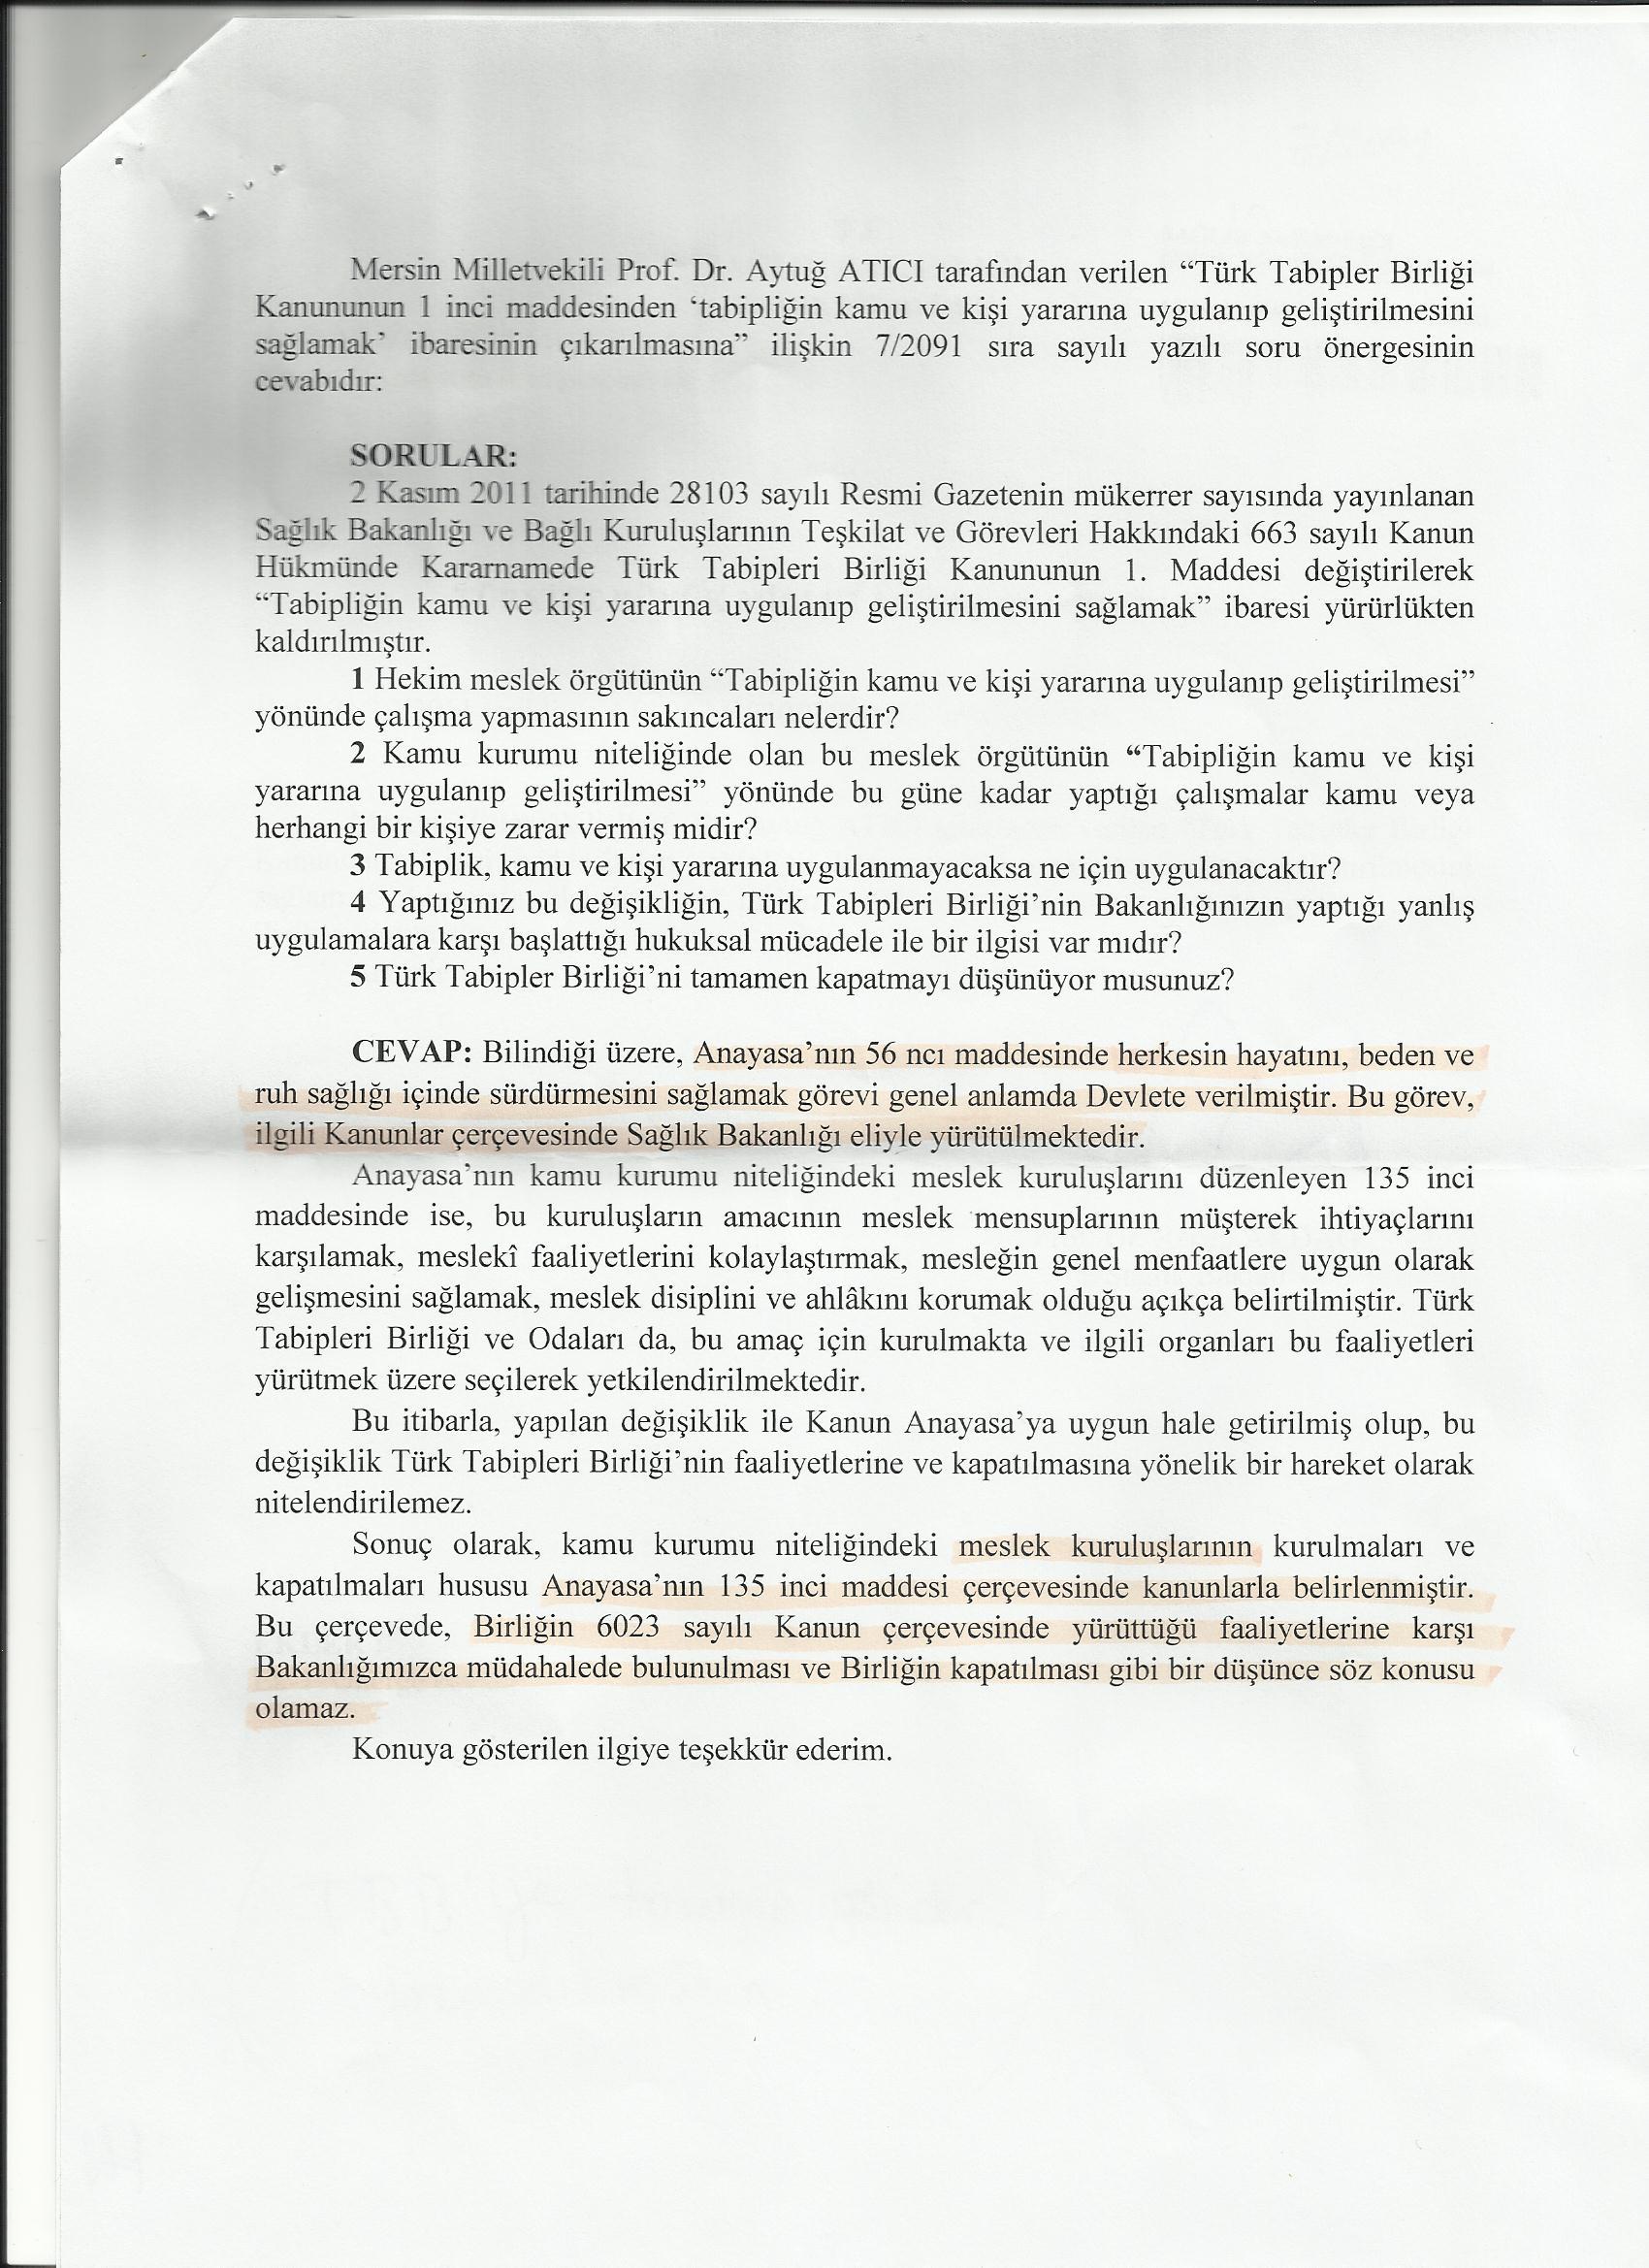 aatici_soru_sf2.jpg